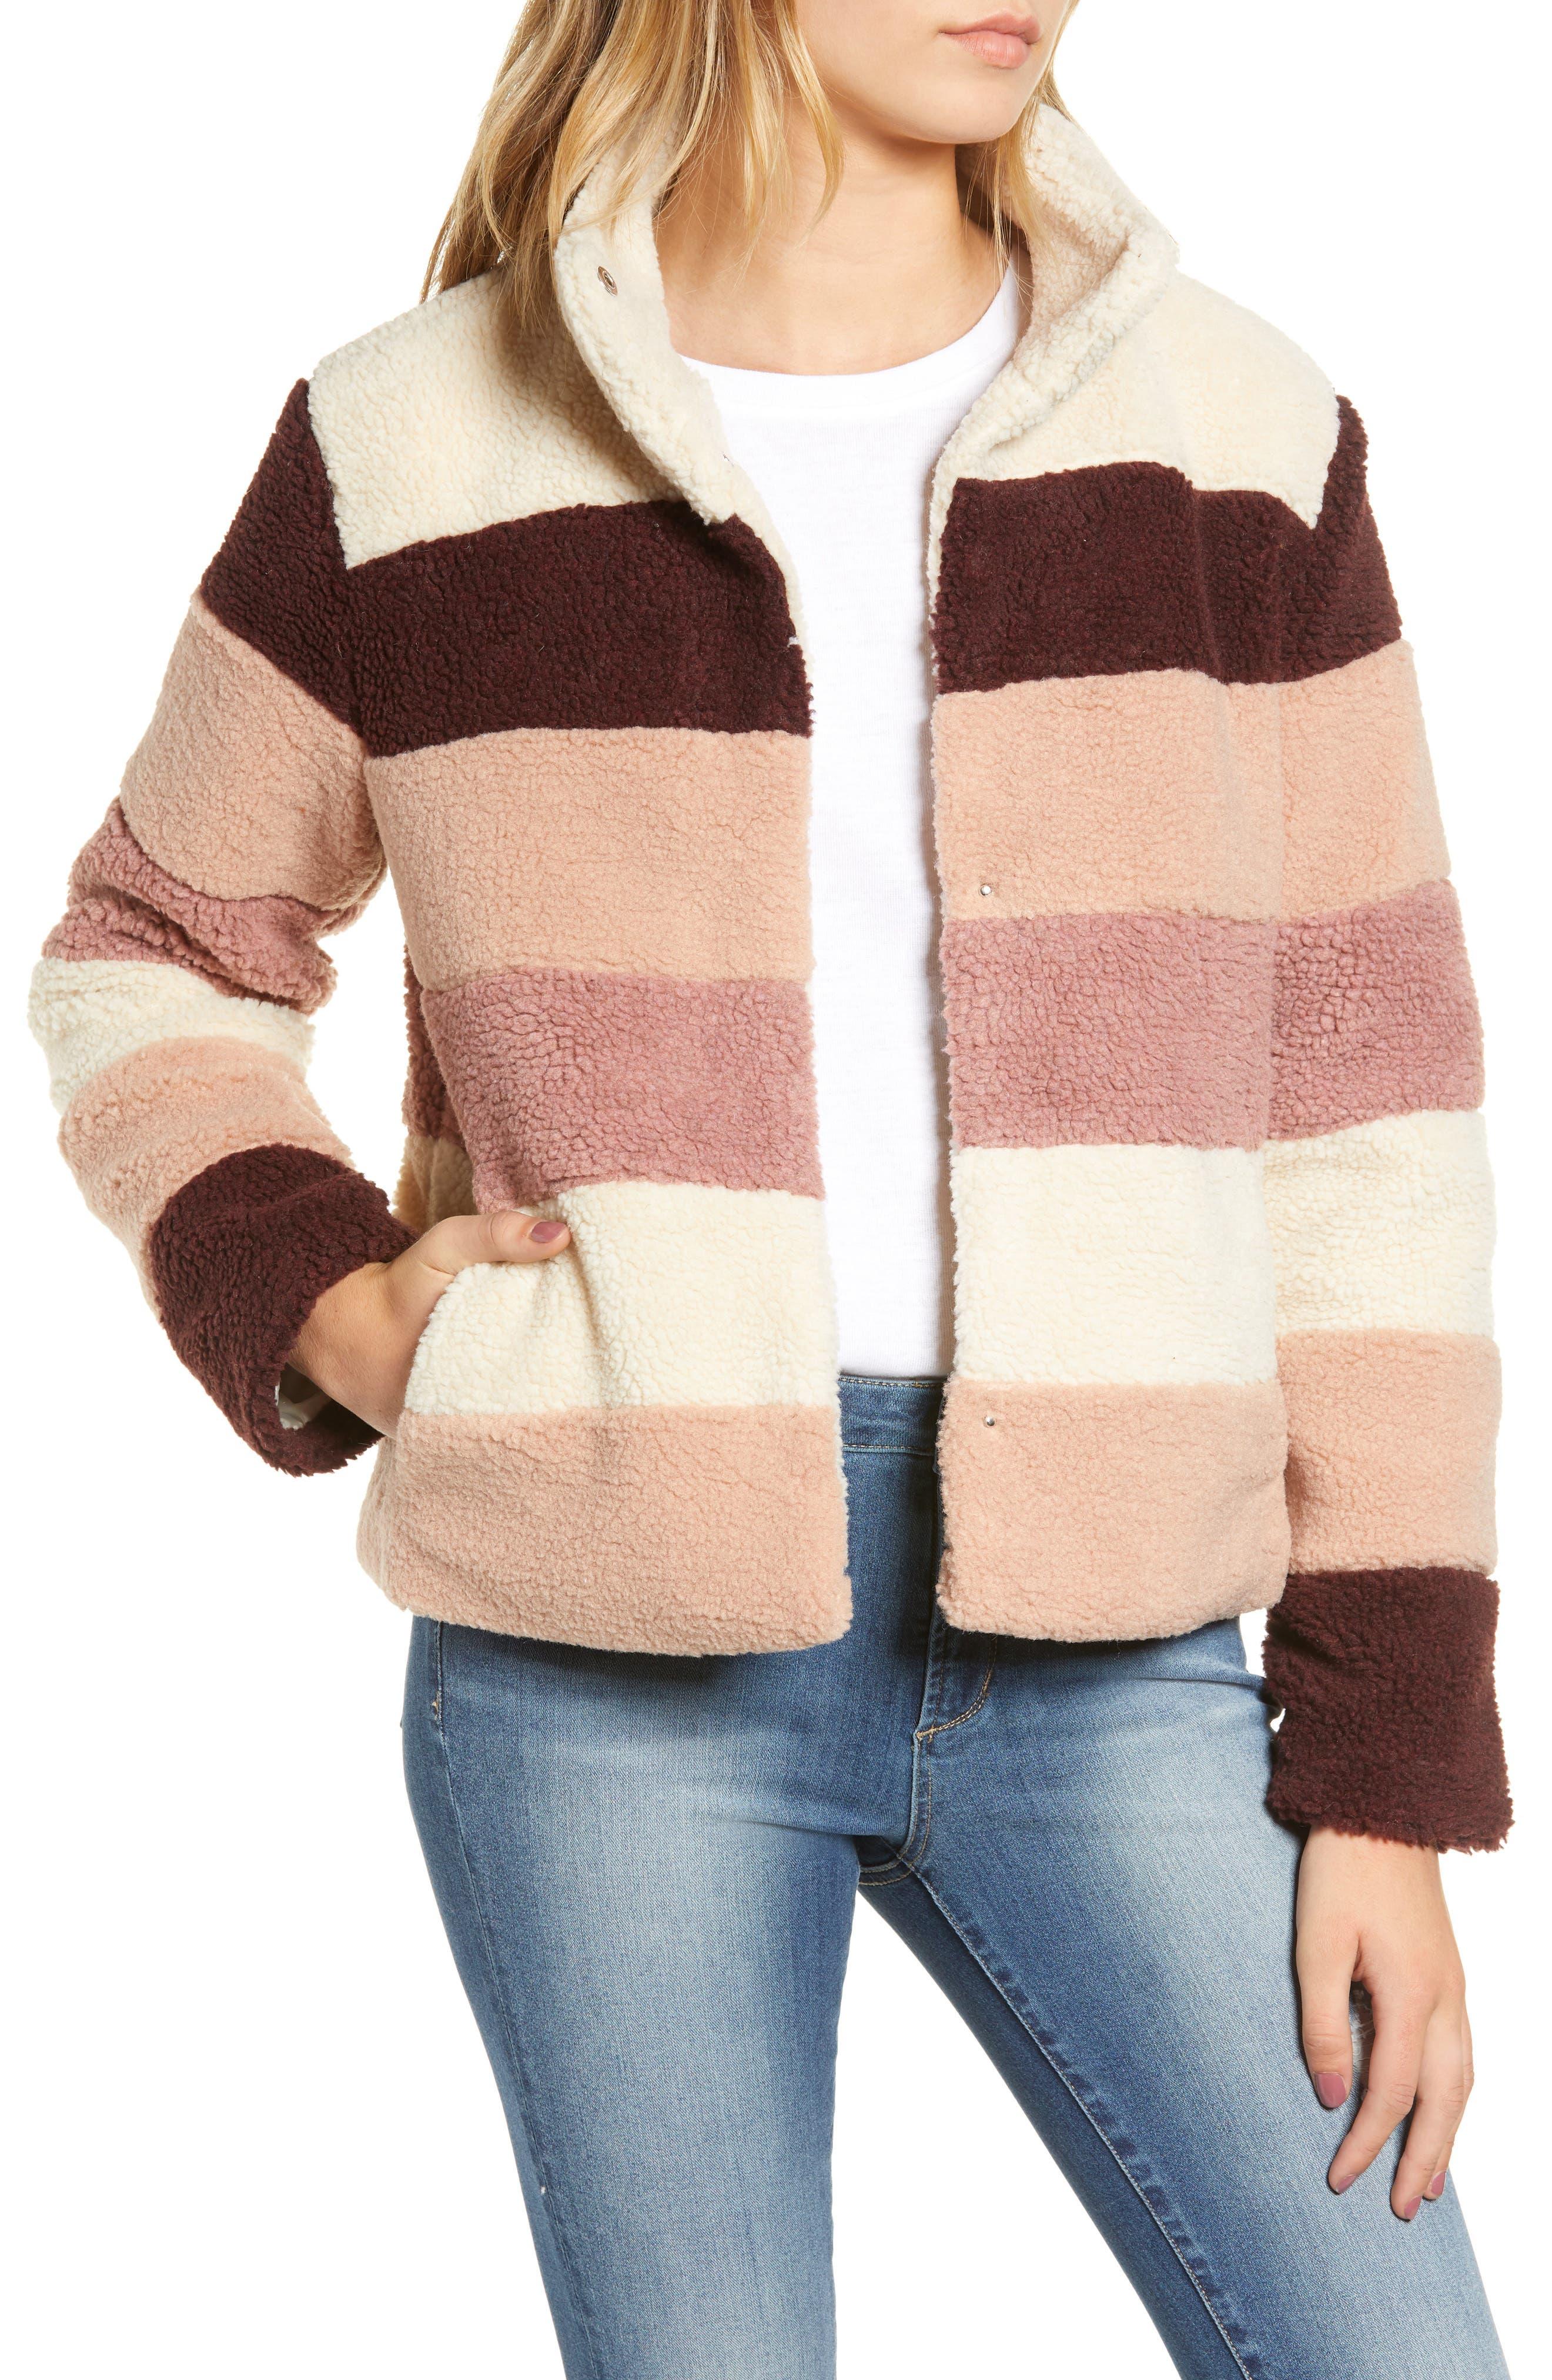 Stripe Faux Shearling Jacket,                             Main thumbnail 1, color,                             IVORY EGRET MUTLI STRIPE